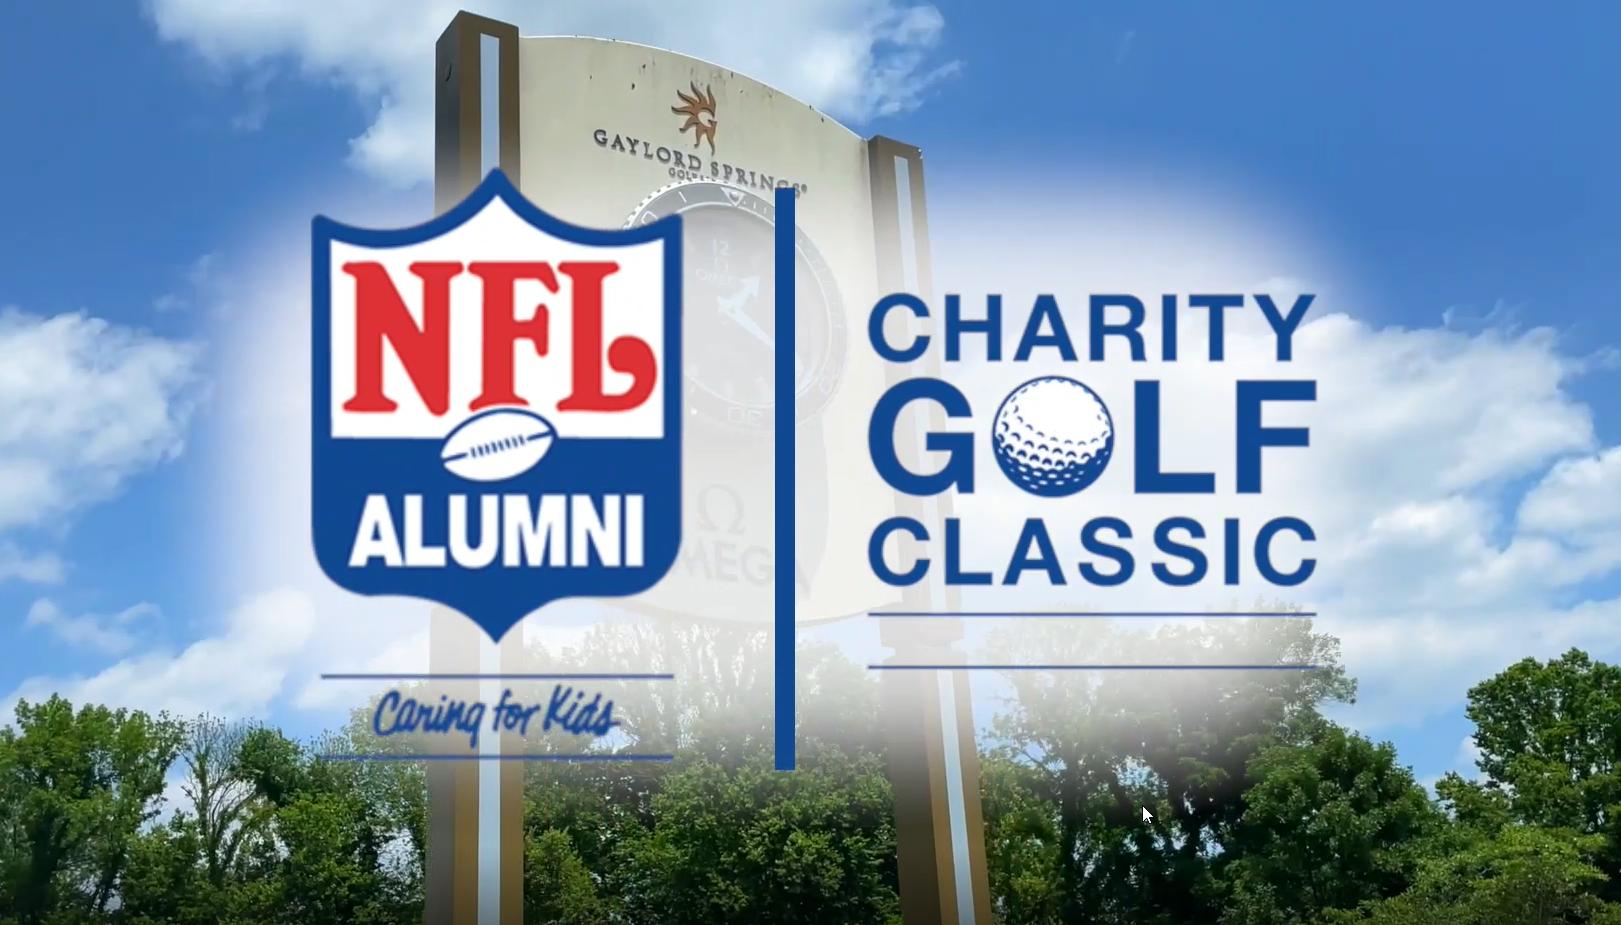 NFL Alumni Charity Golf Classis Logos